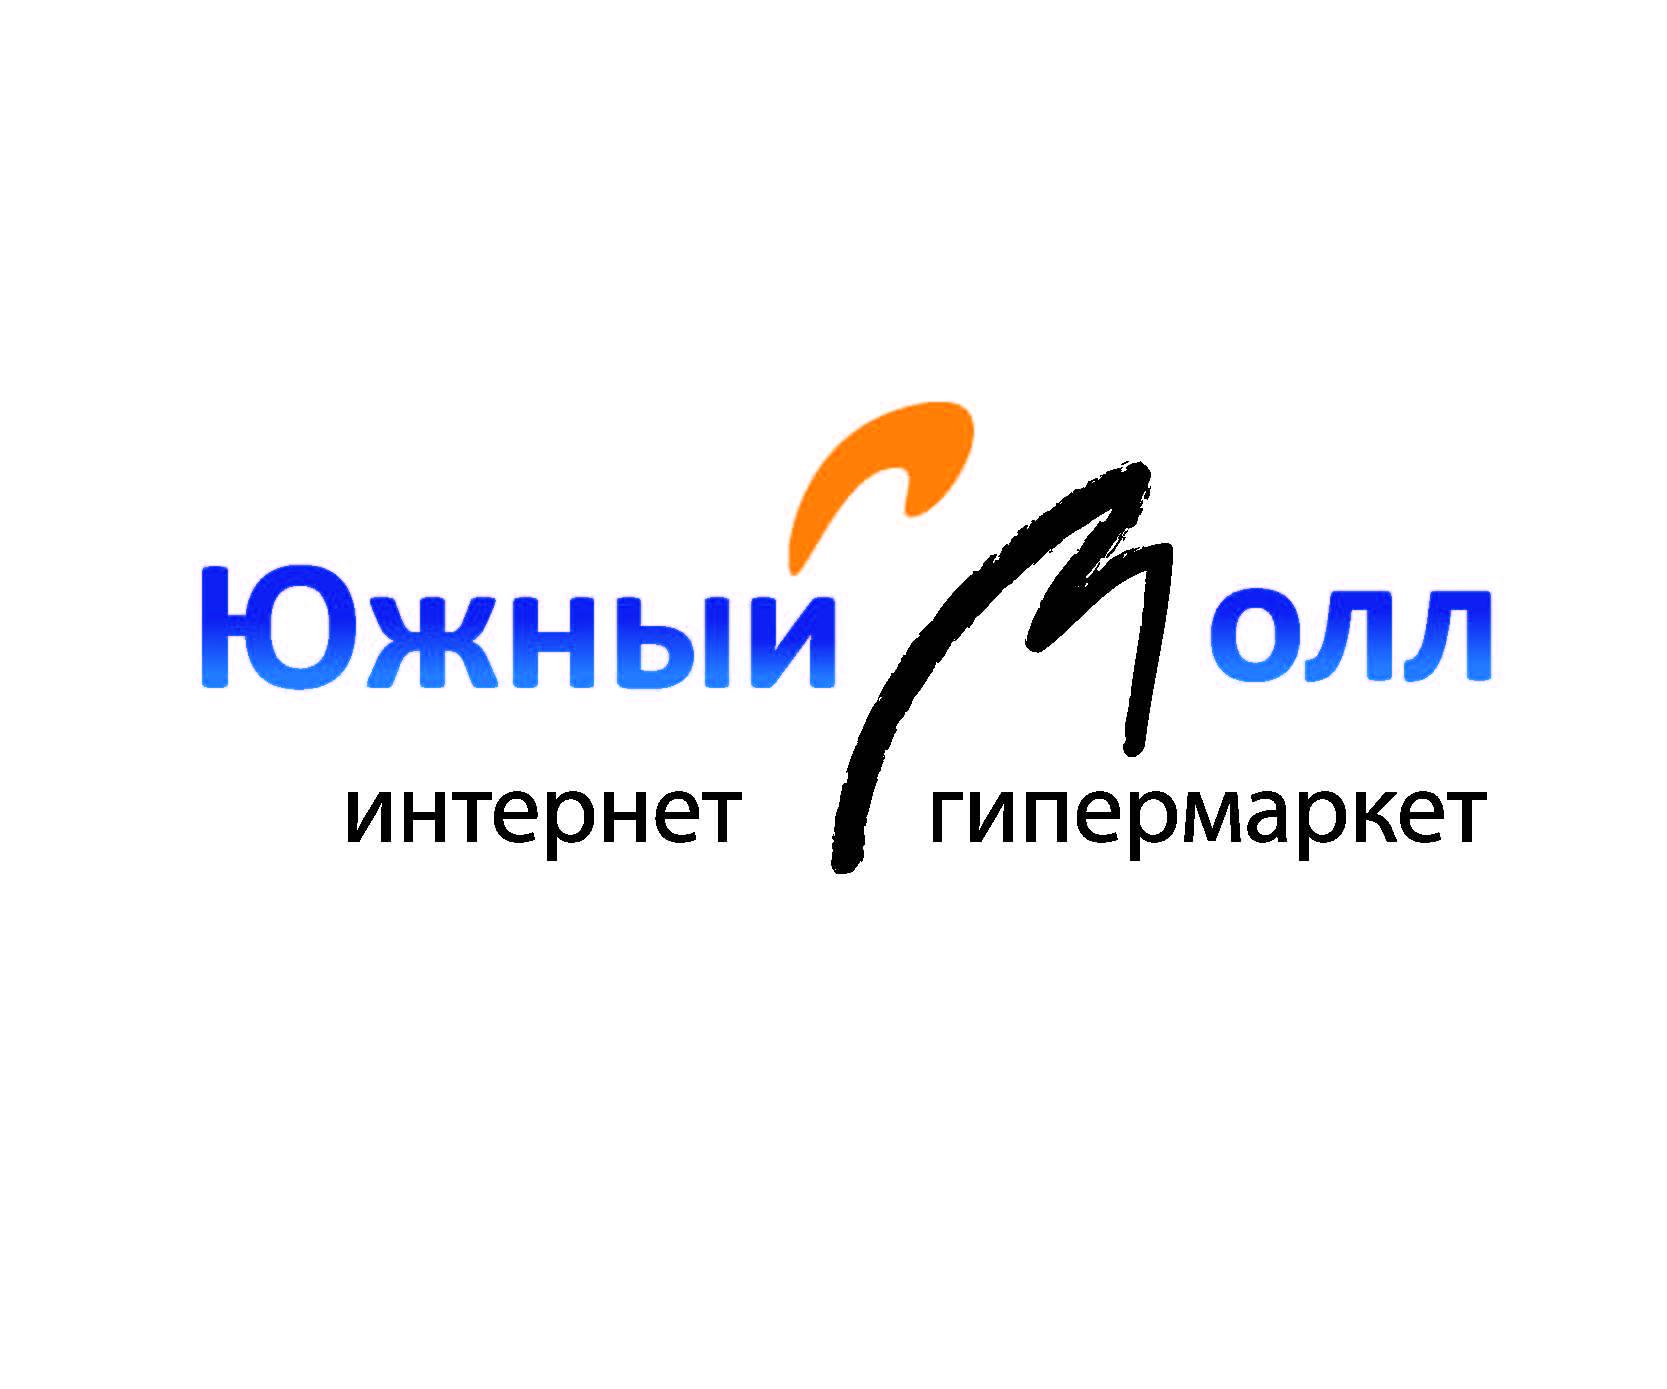 Разработка логотипа фото f_4db1b1552fc2d.jpg